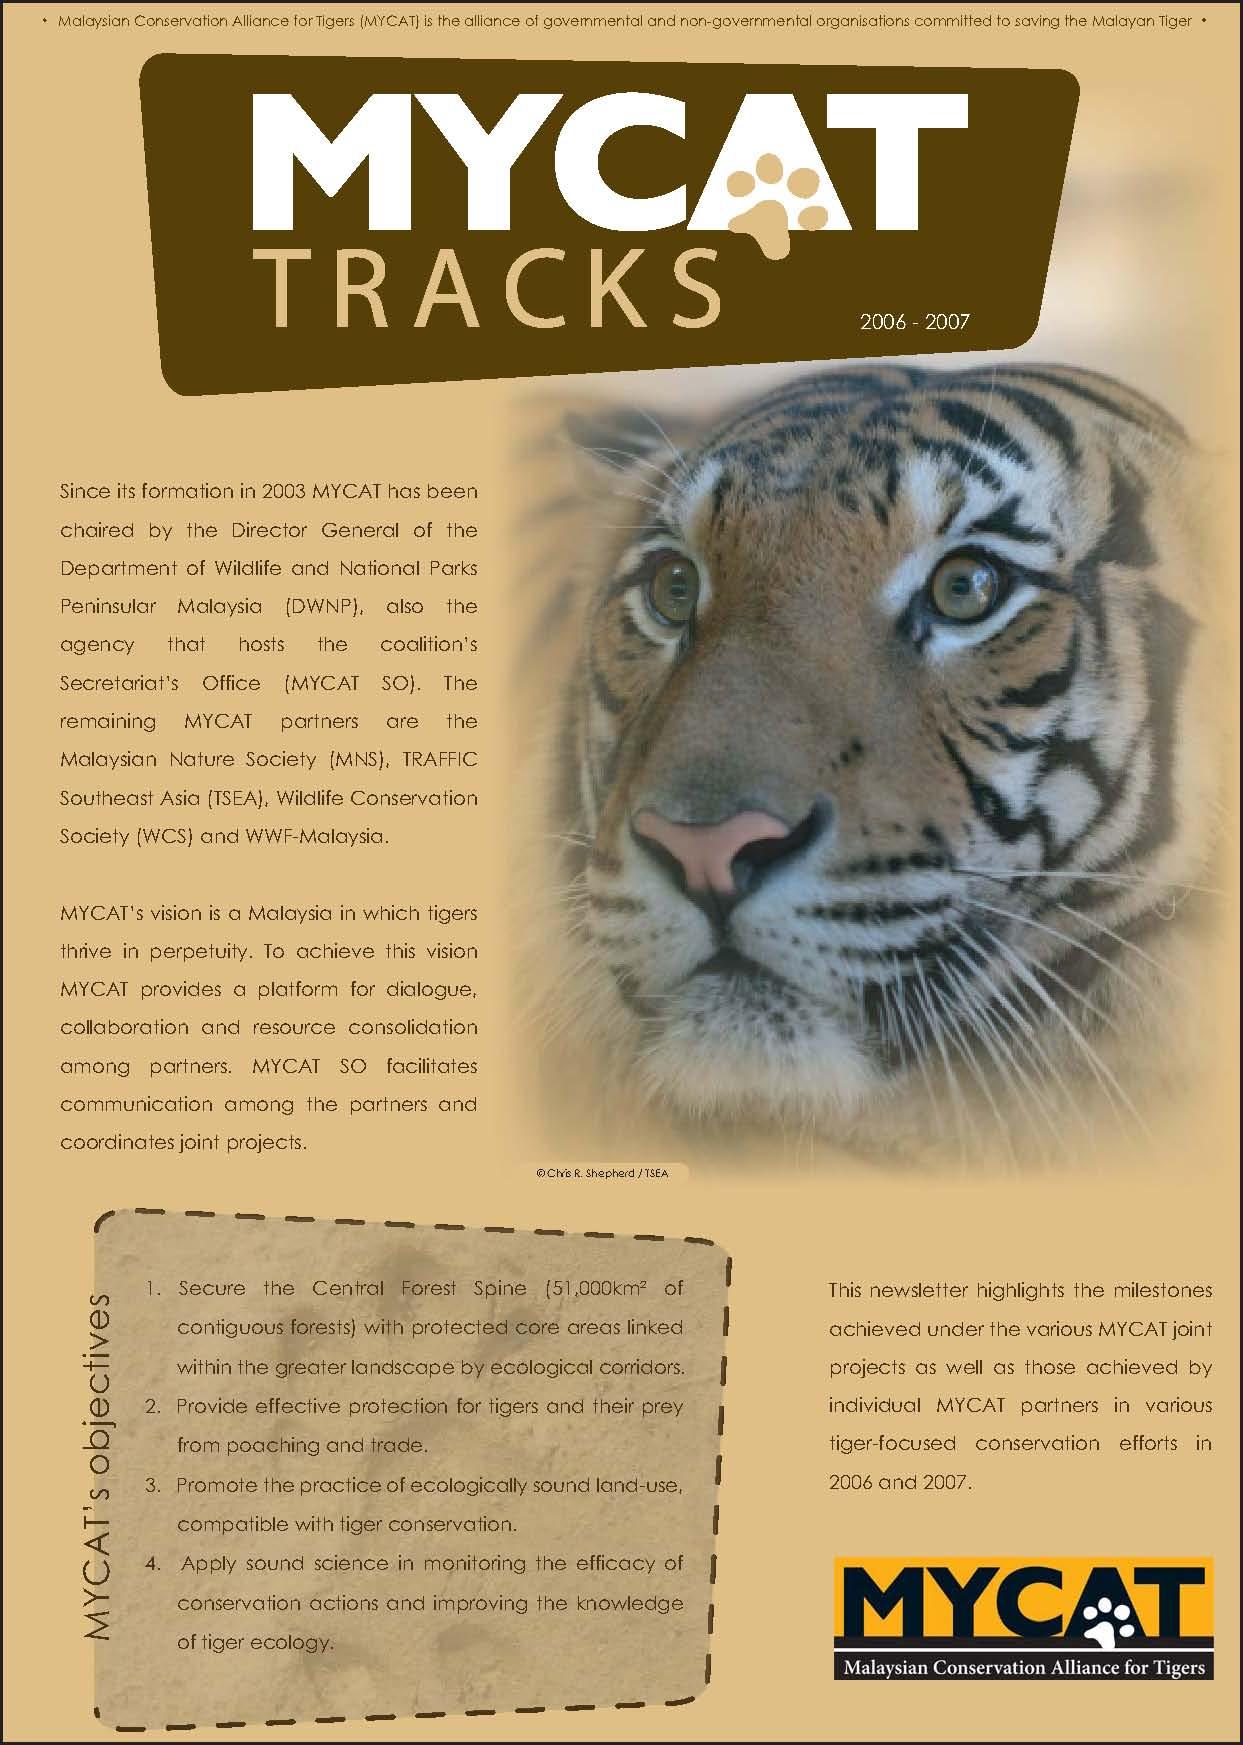 mycat-tracks-2006-2007